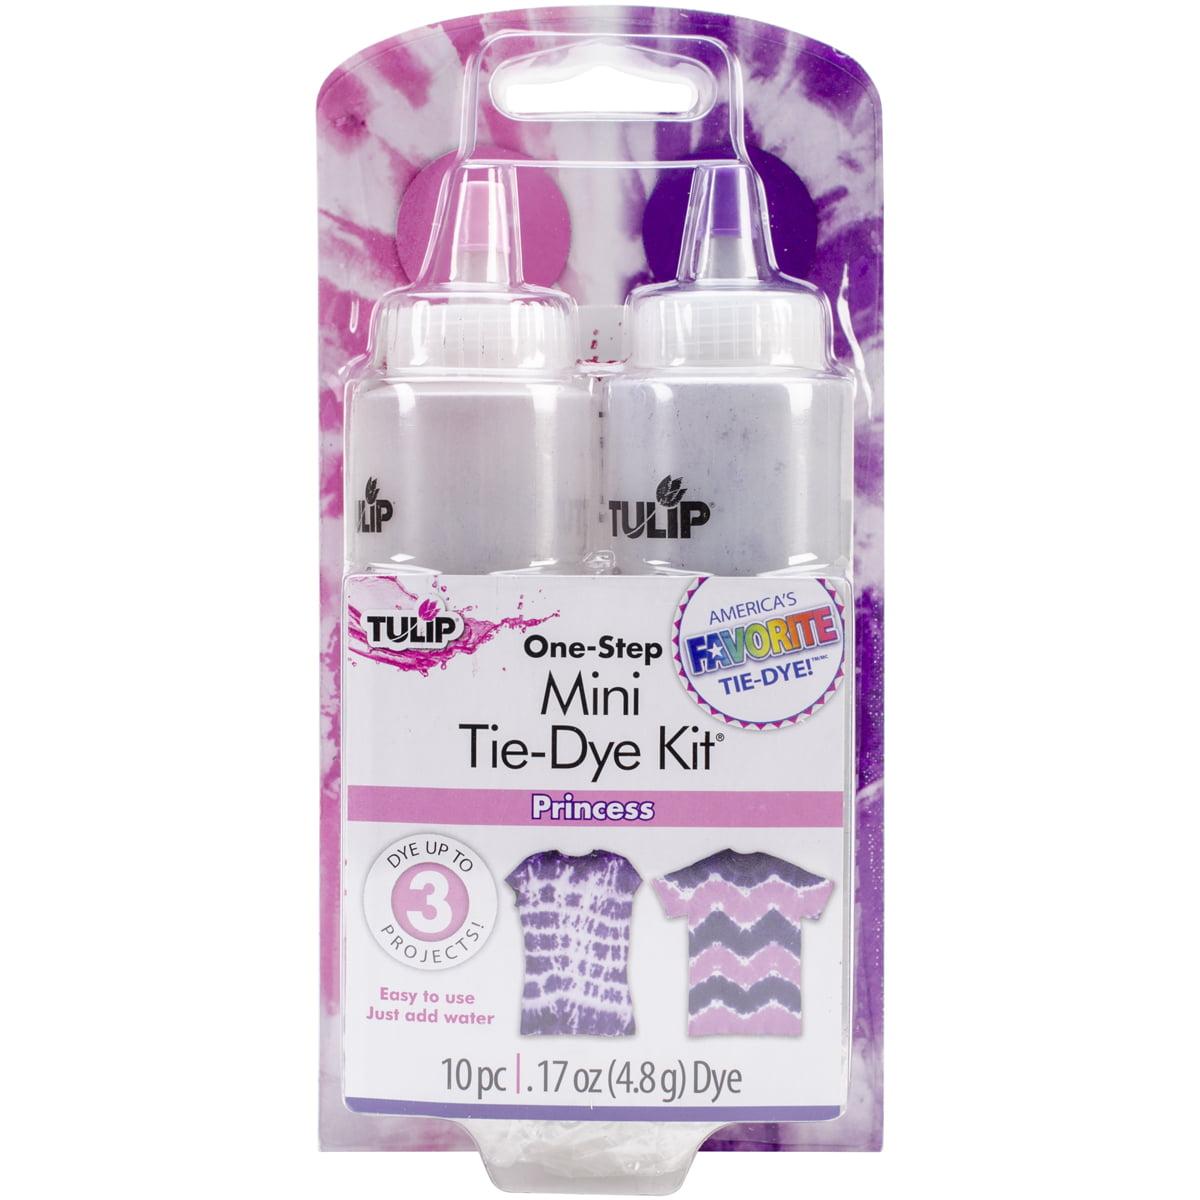 Tulip One-Step Mini Tie-Dye Kit-Princess